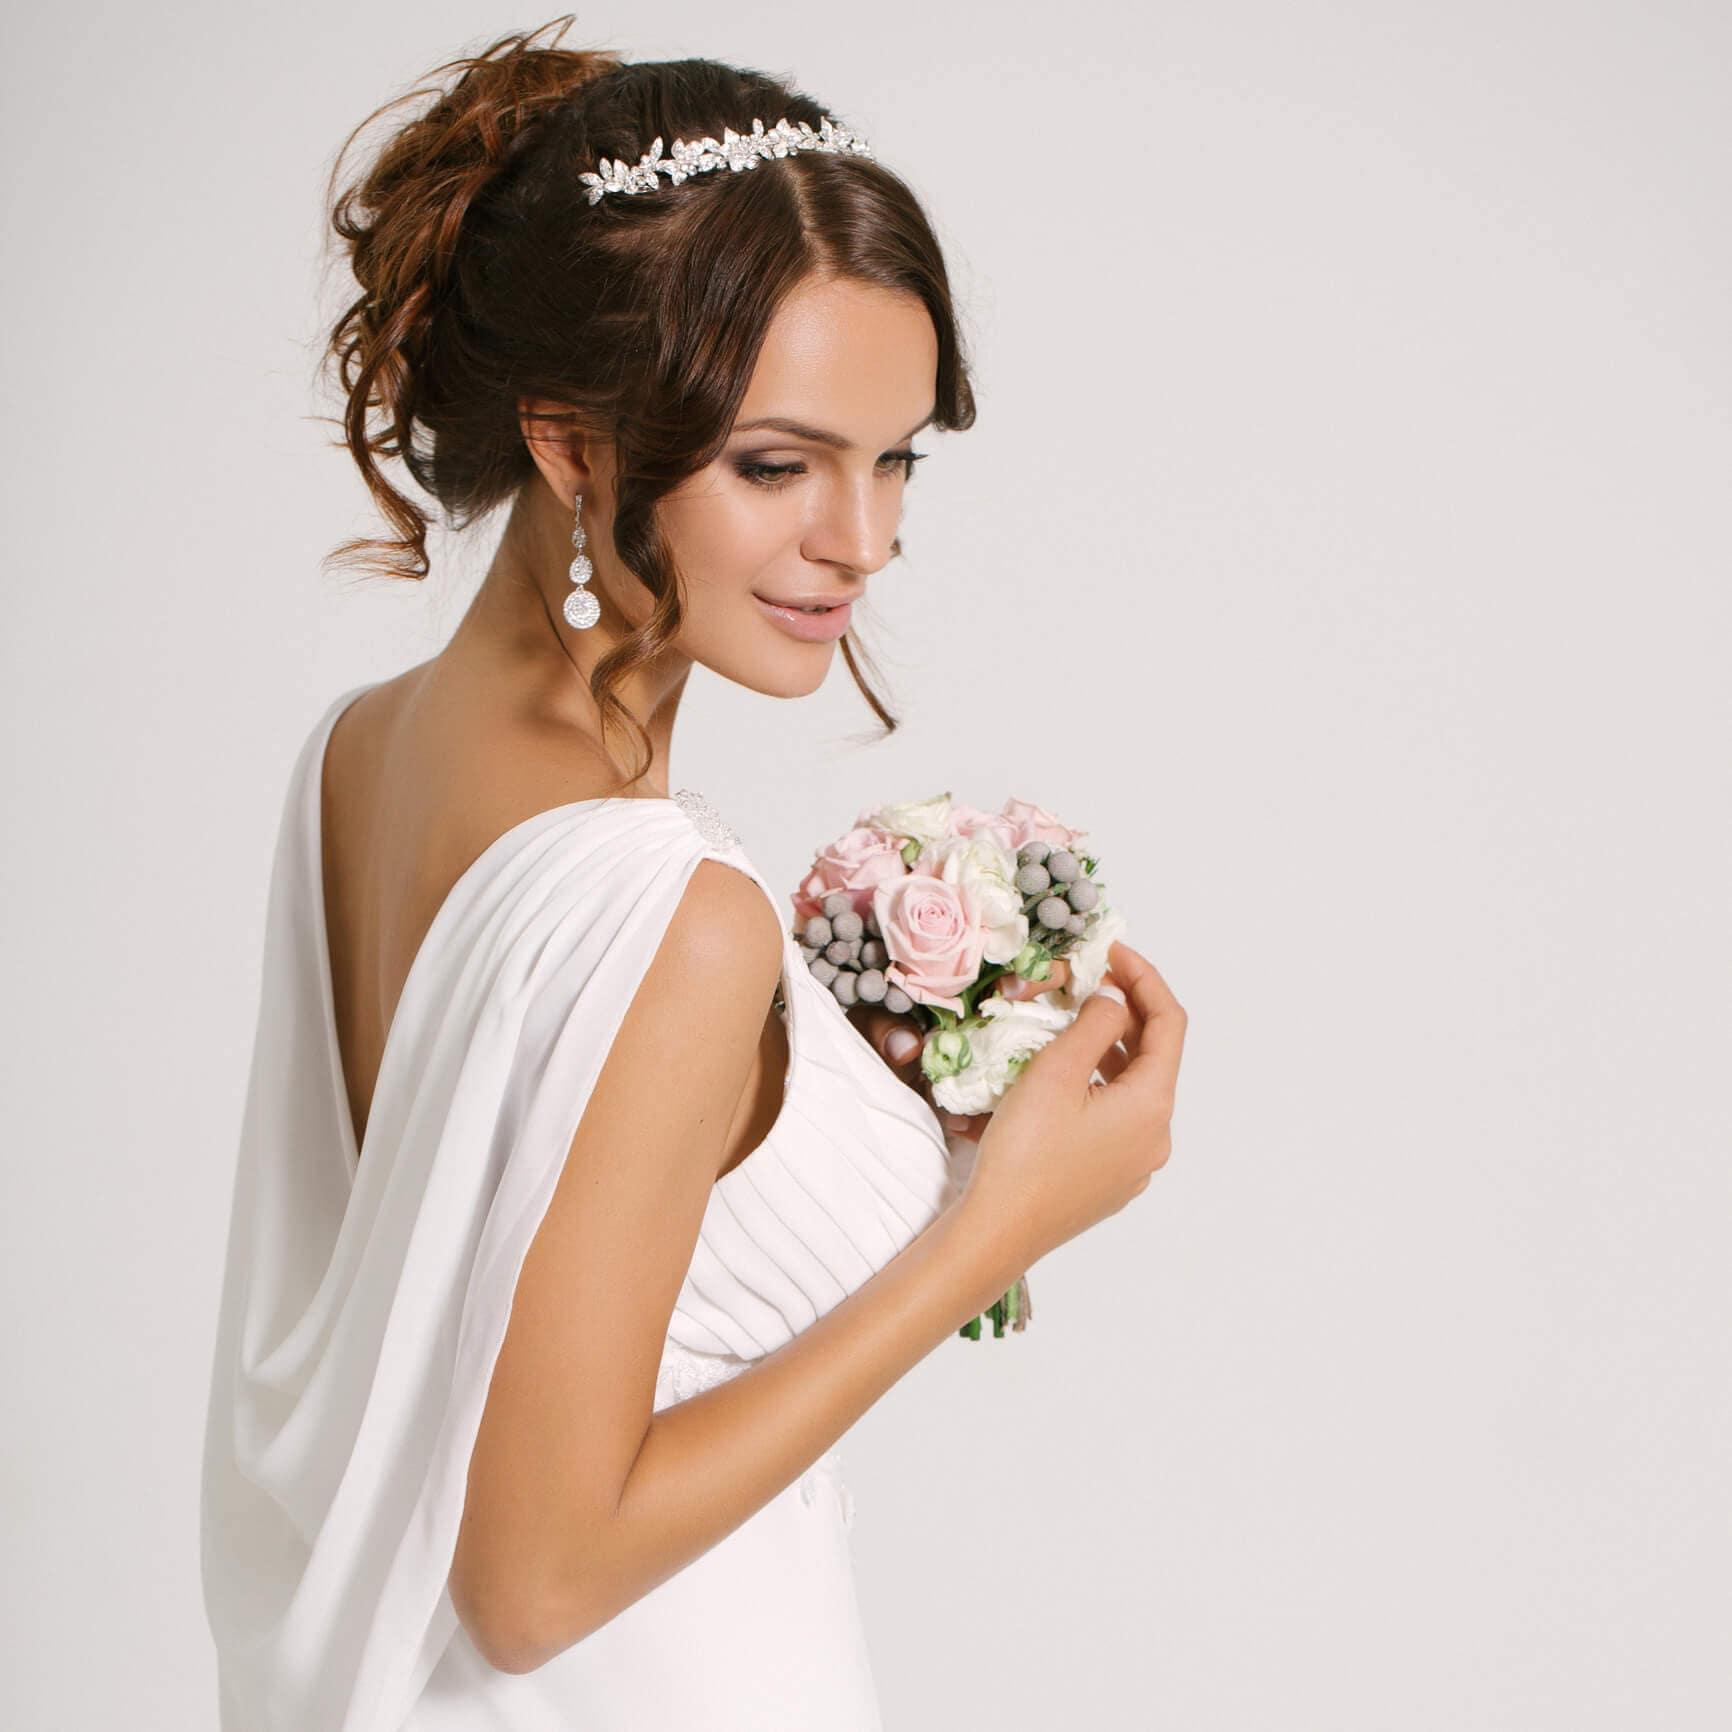 peinados de novia cabello mediano moño griego